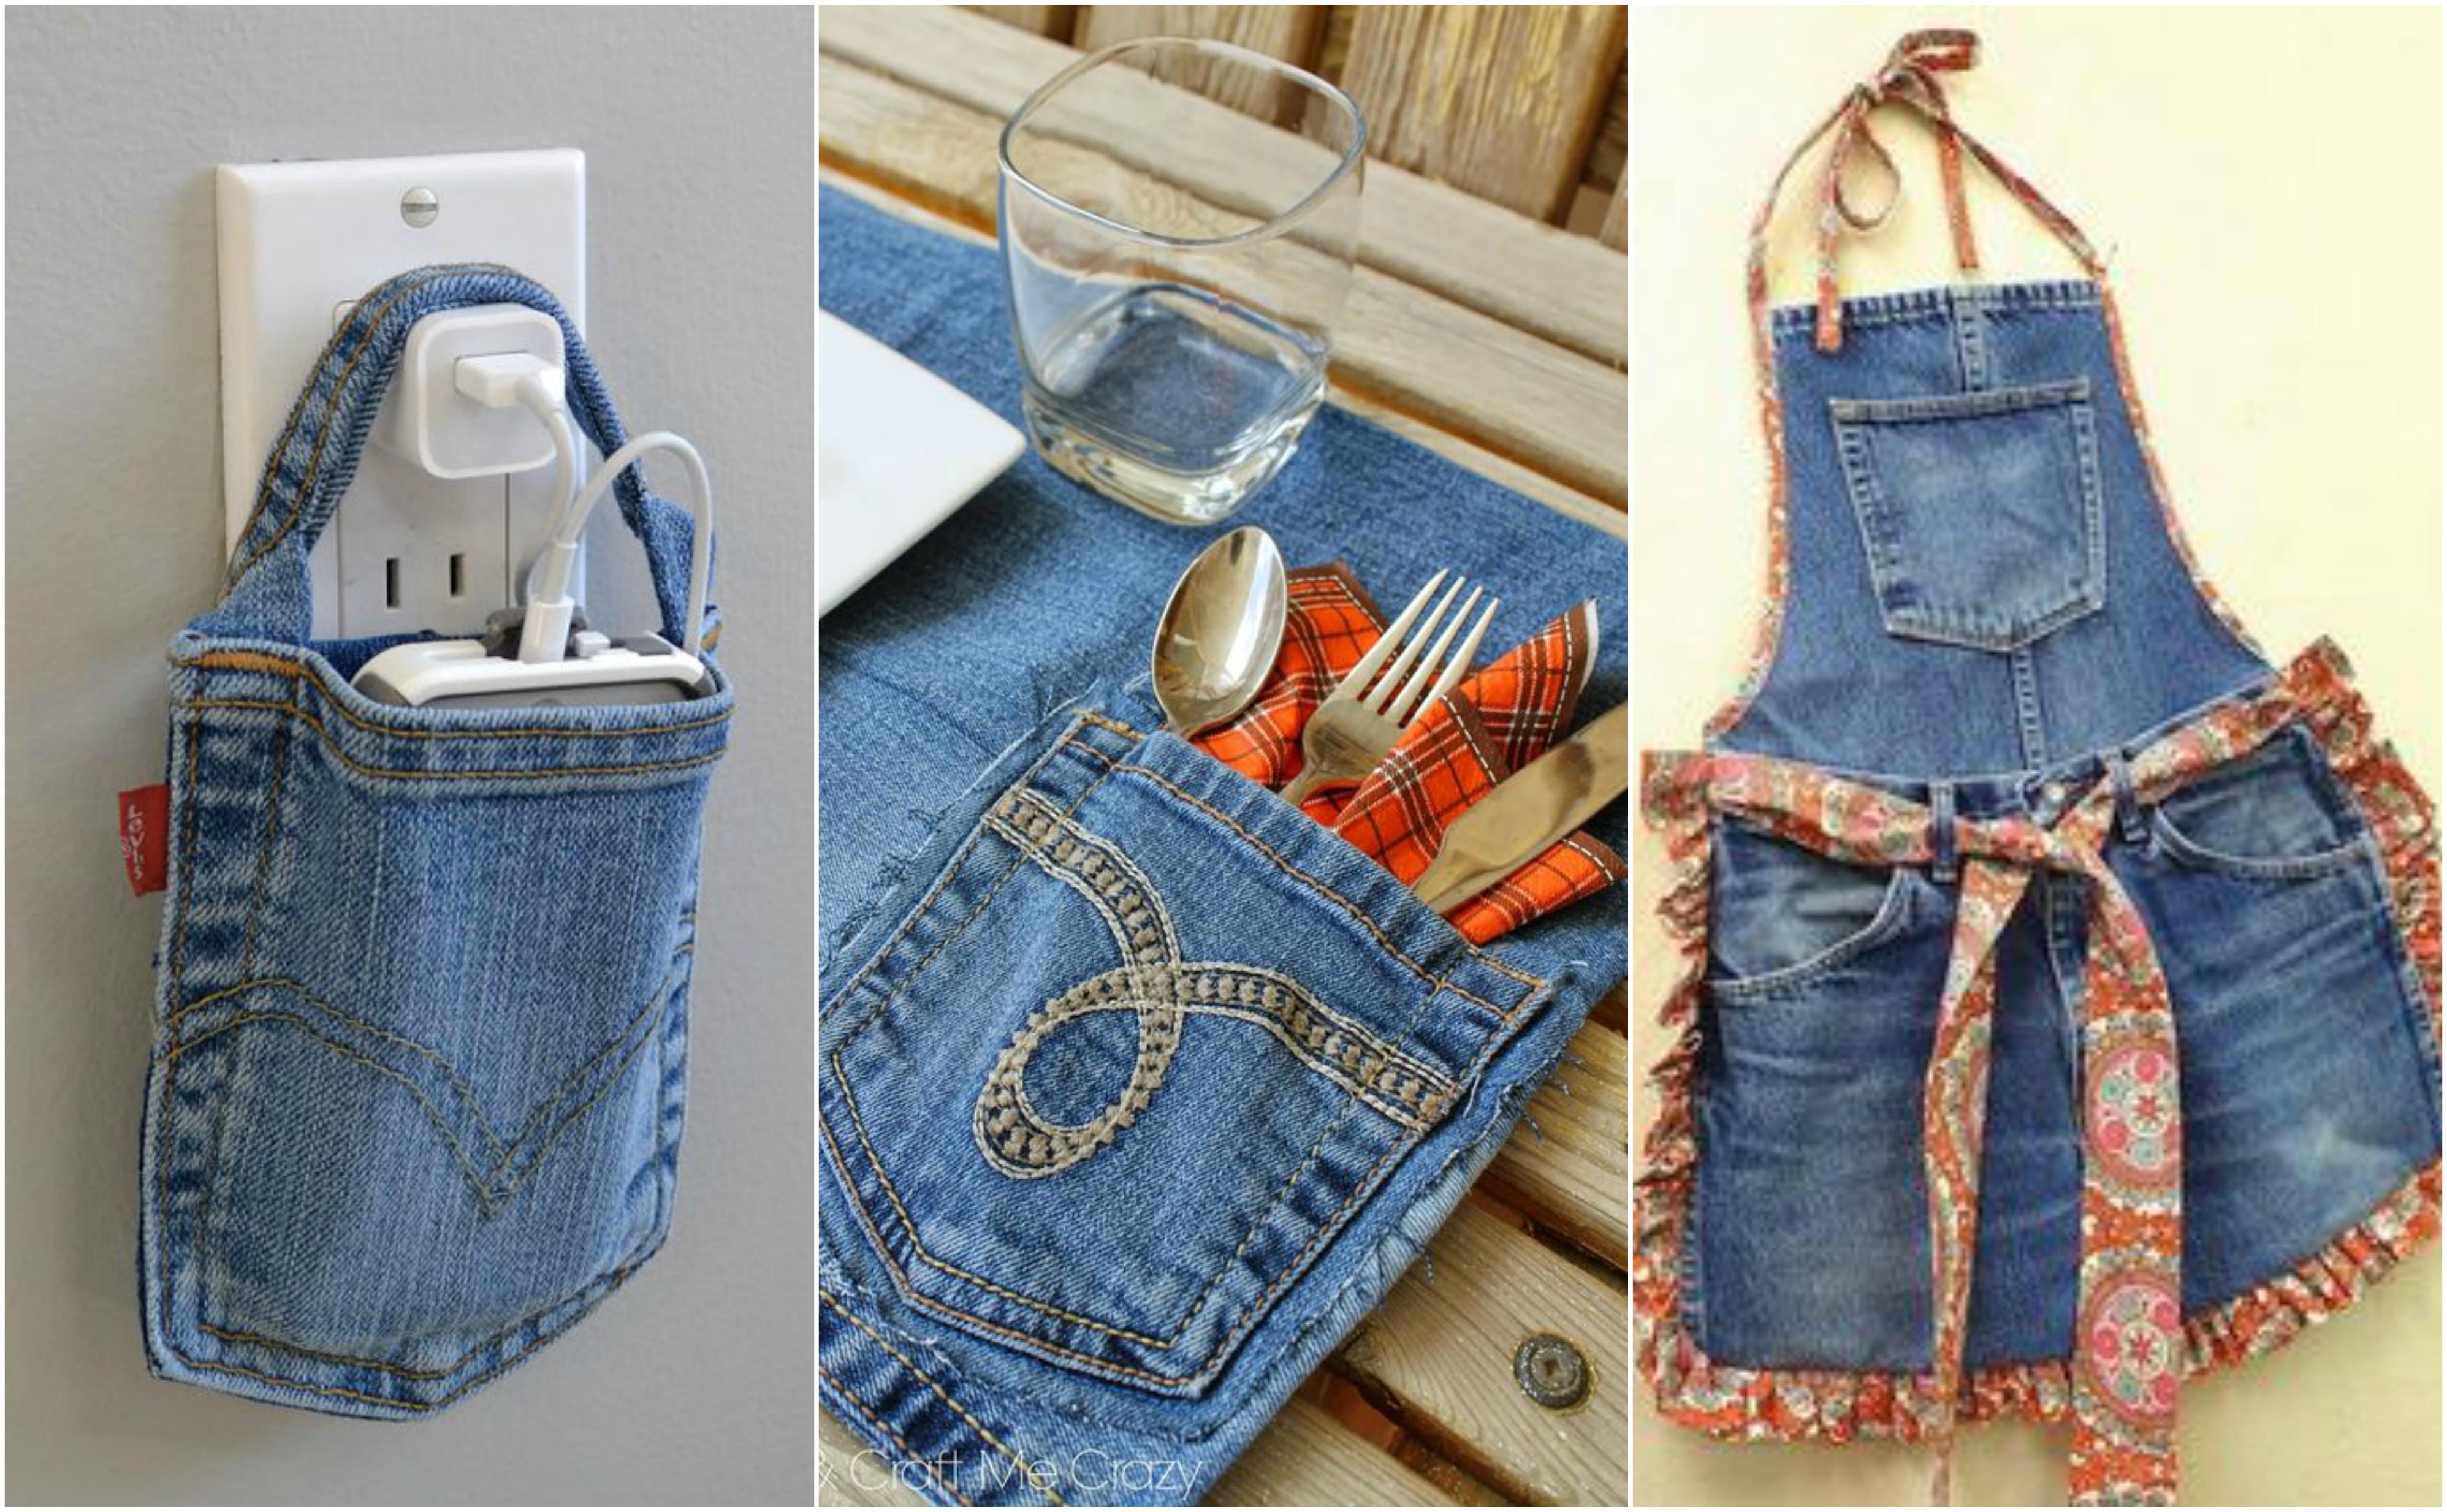 13 kreative ideen aus alten jeans. Black Bedroom Furniture Sets. Home Design Ideas